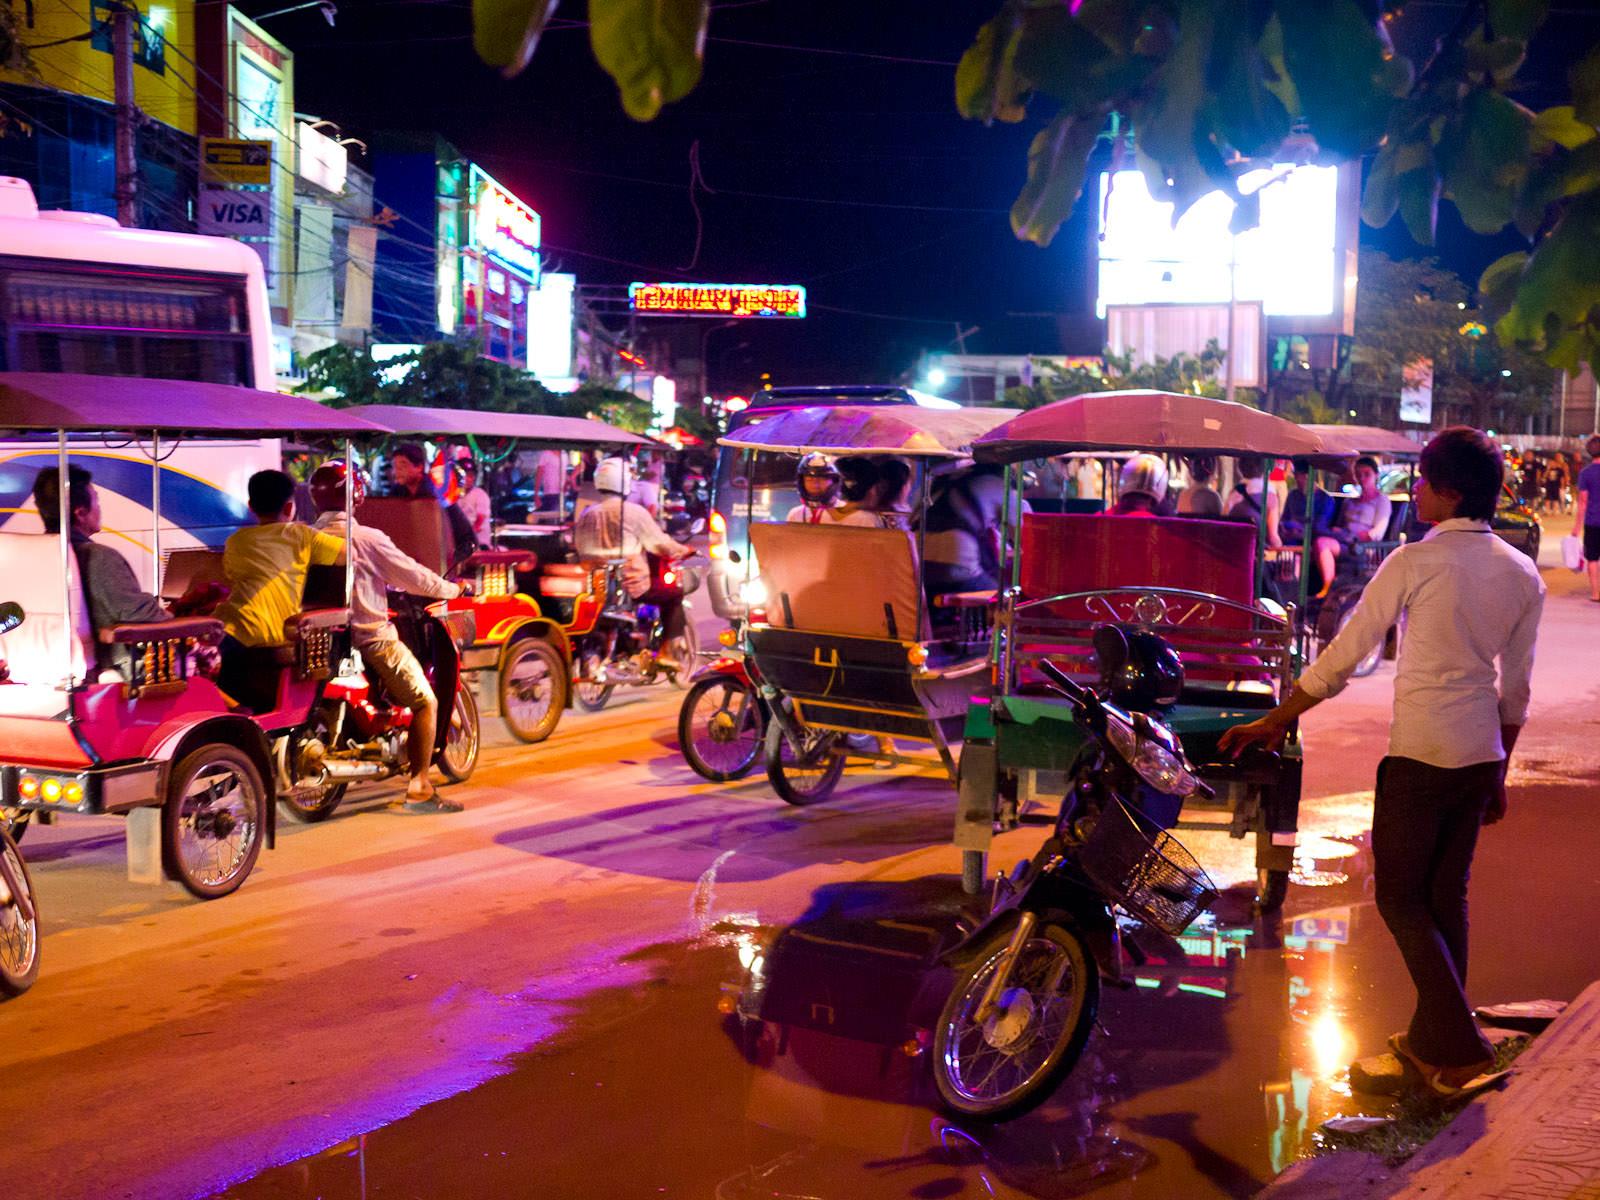 Walking to the night market